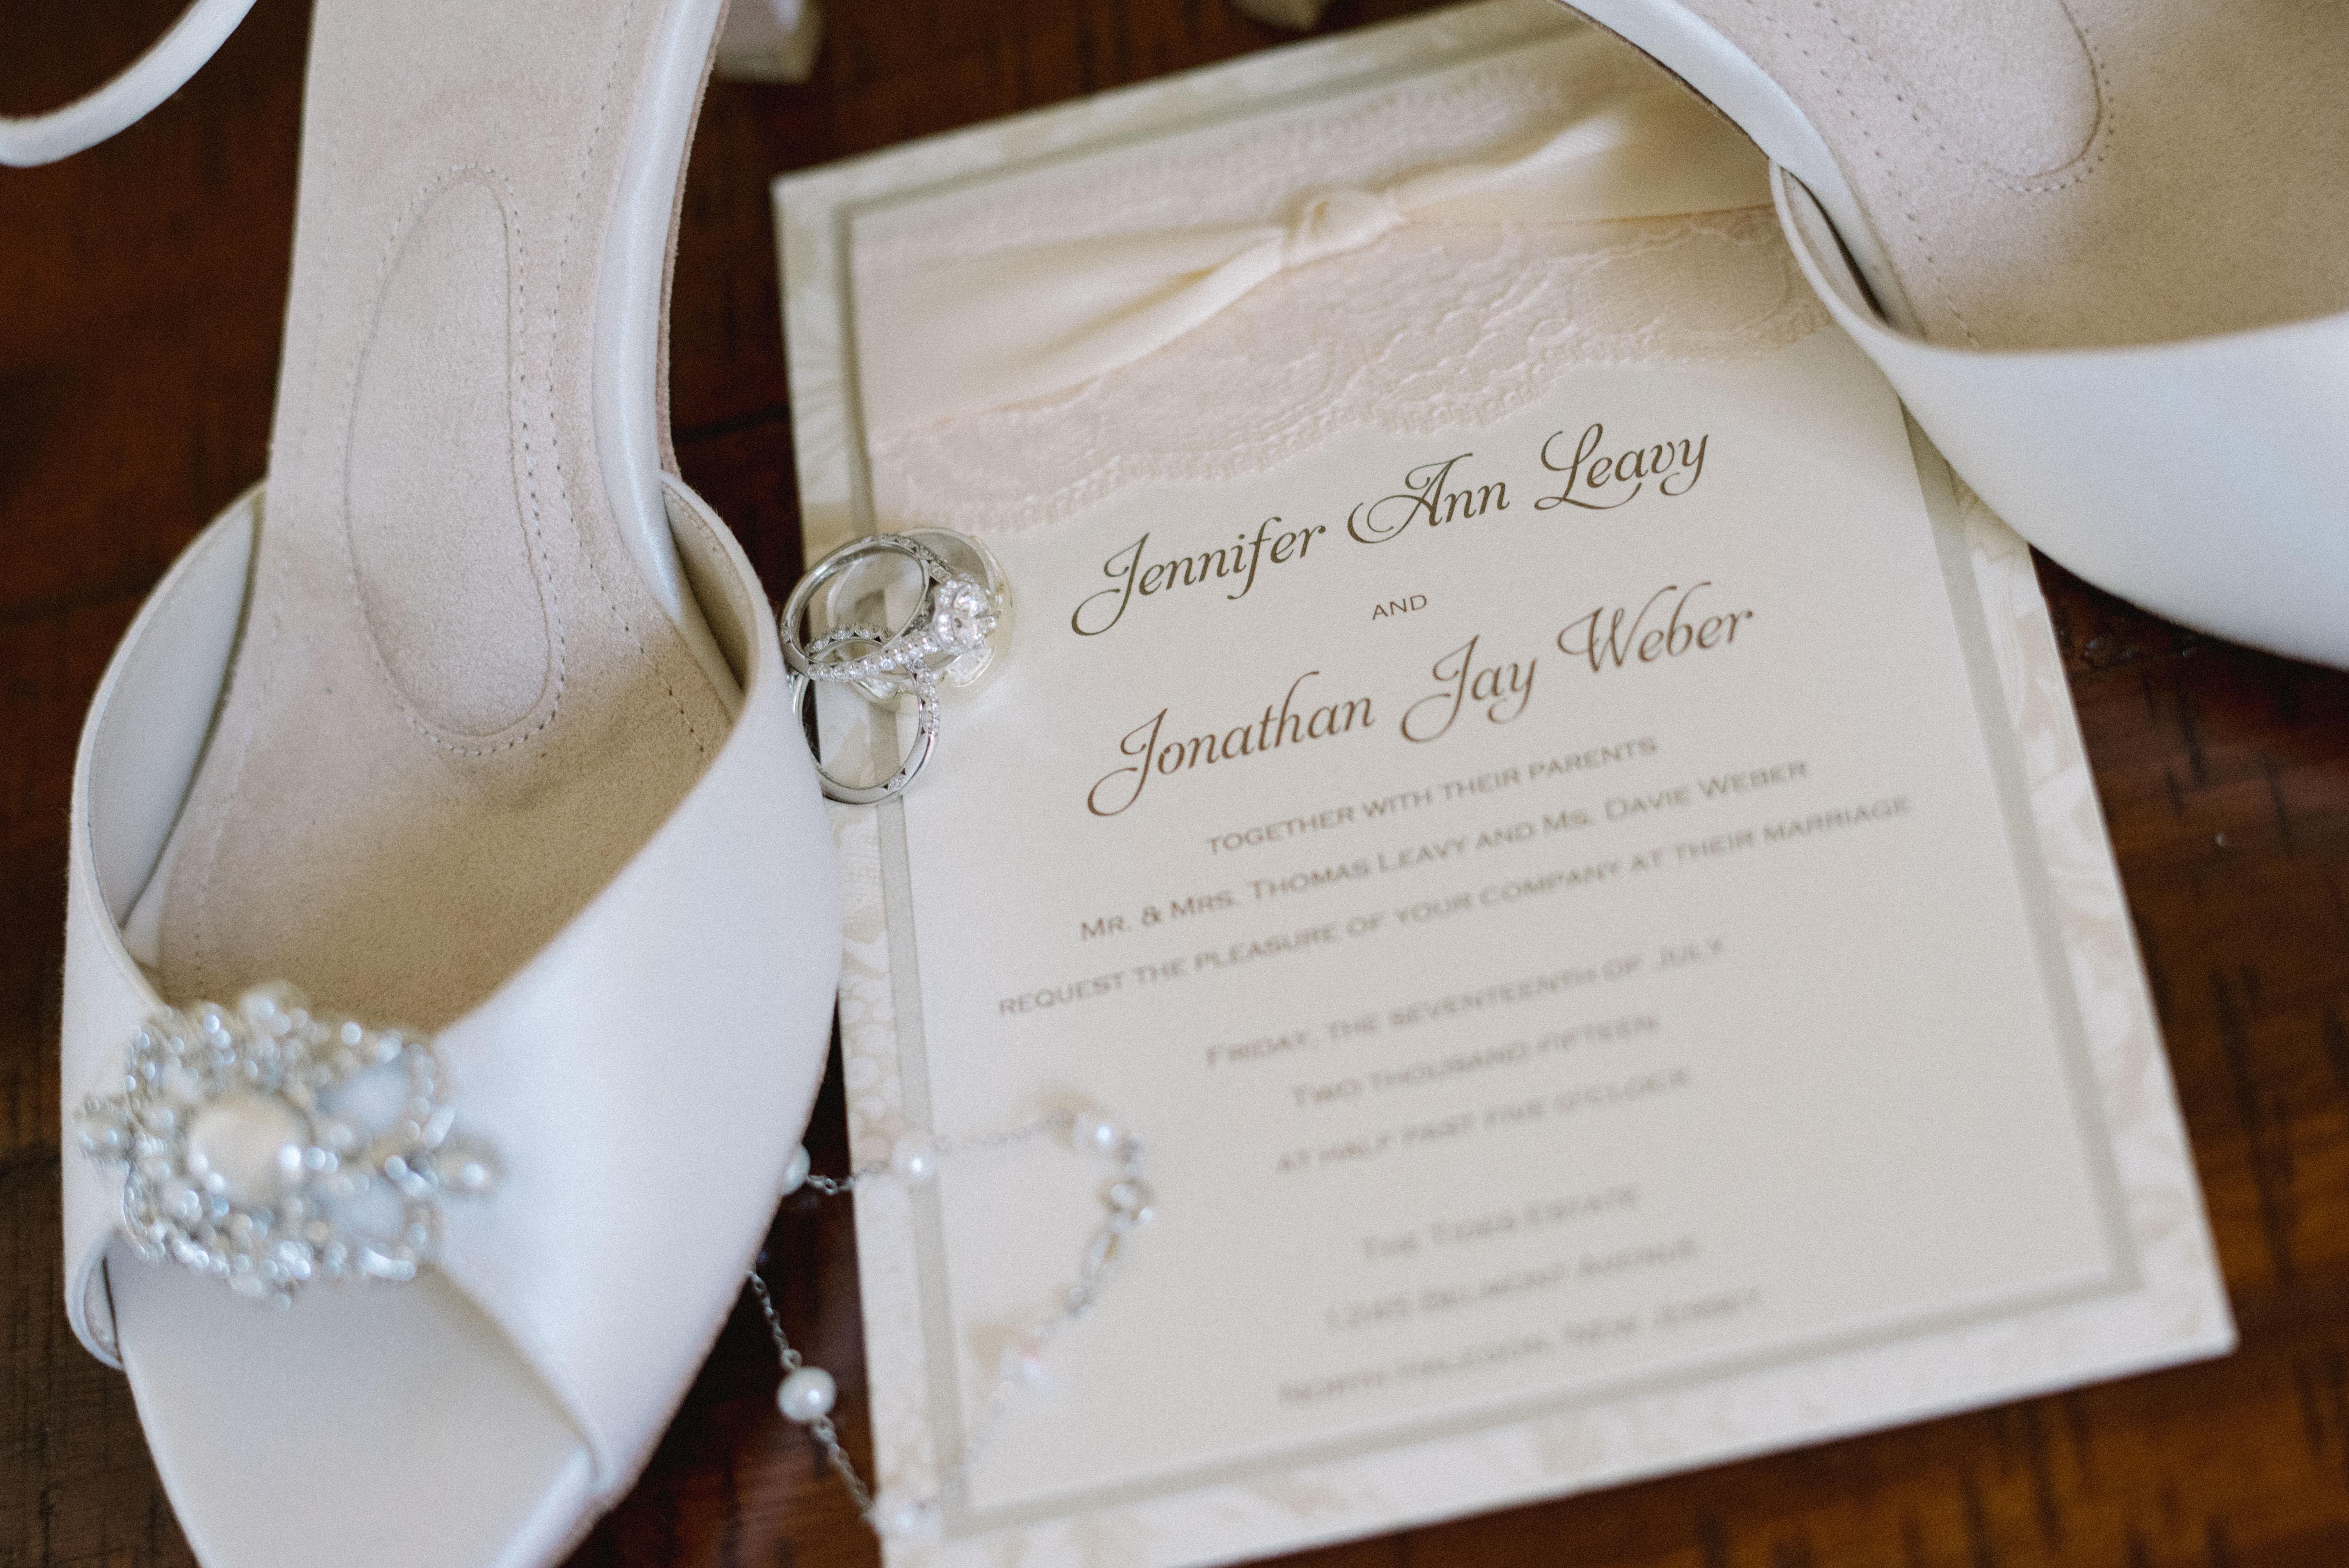 Luxury Online Wedding Invitation Boutique, Lavender Paperie, Unveils ...